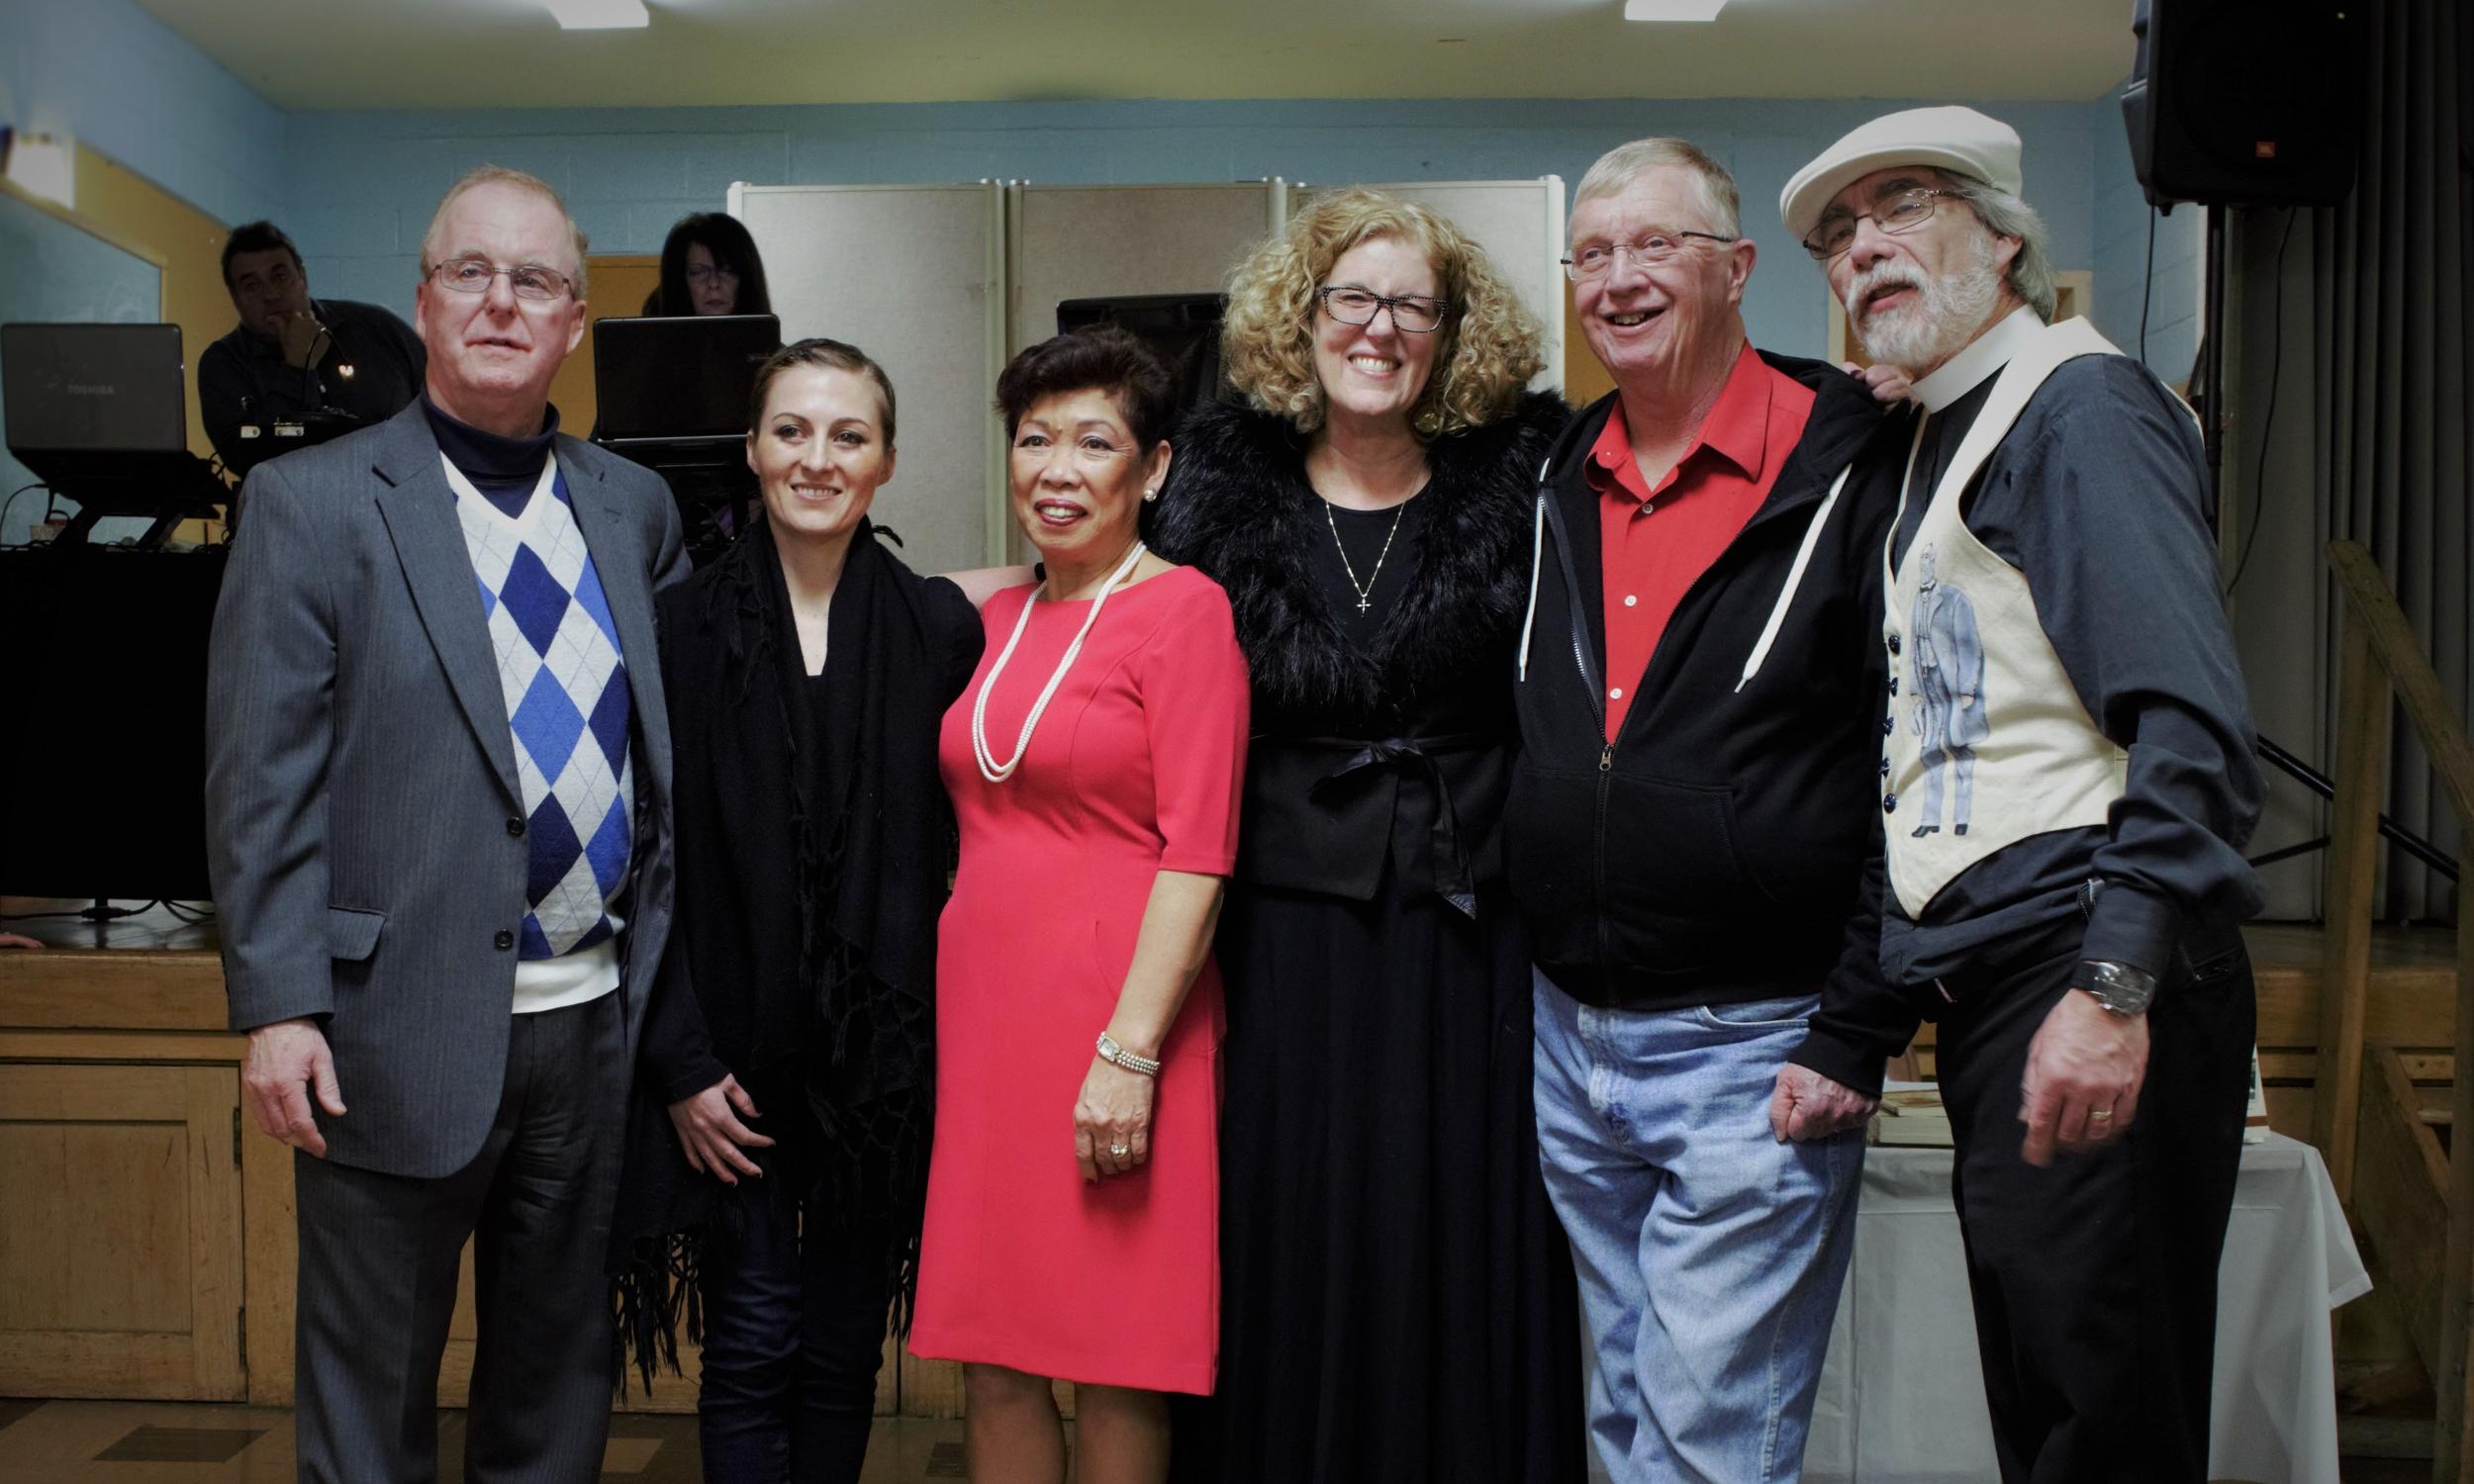 From Left: Lou Cox (Treasurer), Alexandria Tava (Vice President), Julie Cox (Founder), Pamela Pater-Ennis (President), Philip Melius (Member At-Large),Mark Ennis (Secretary).